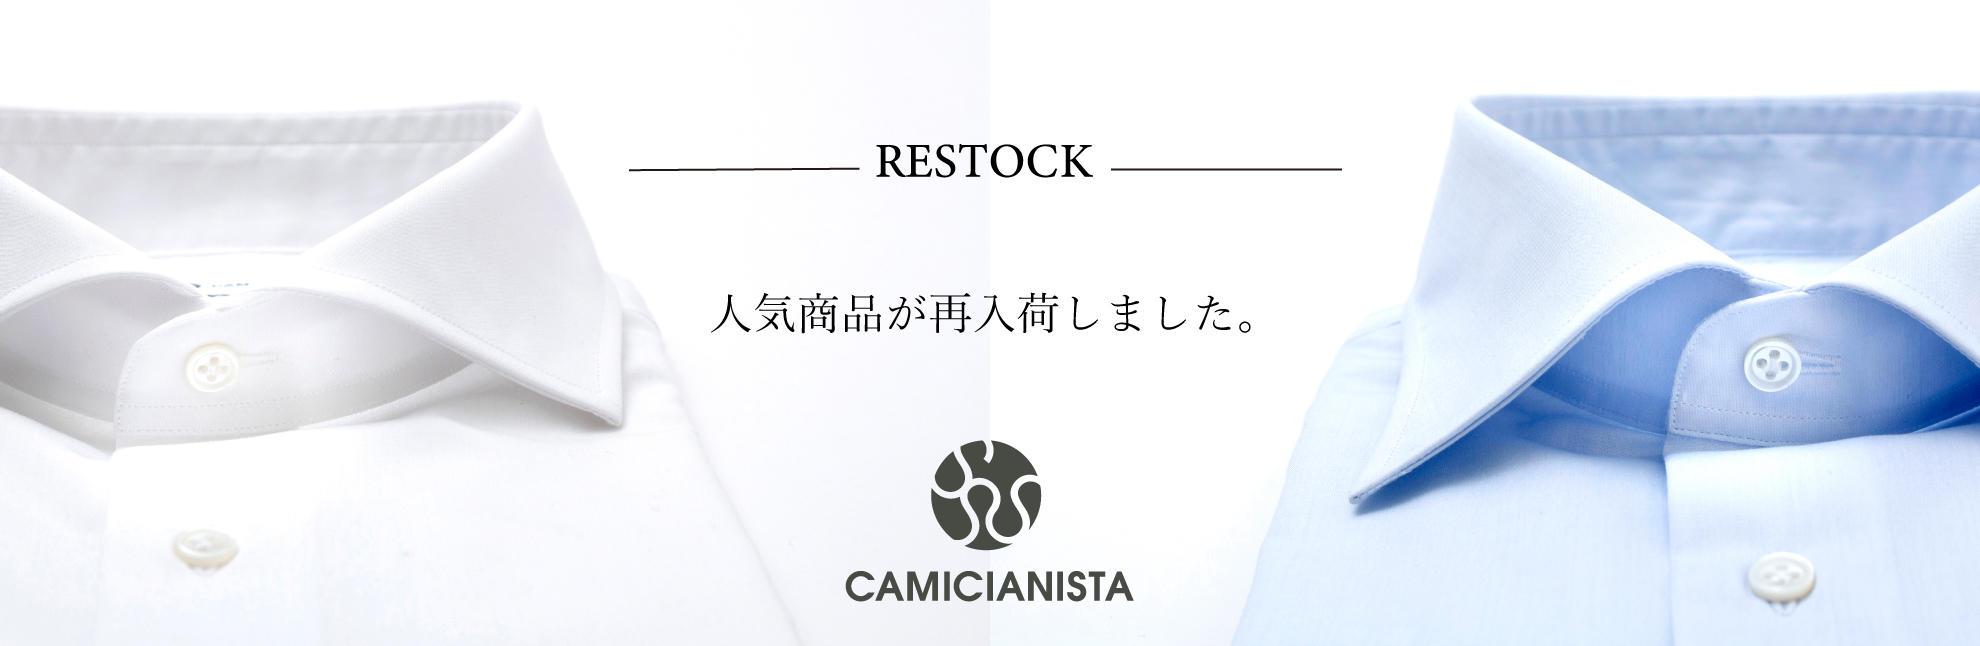 restcok CAMICIANISTA(カミチャニスタ)